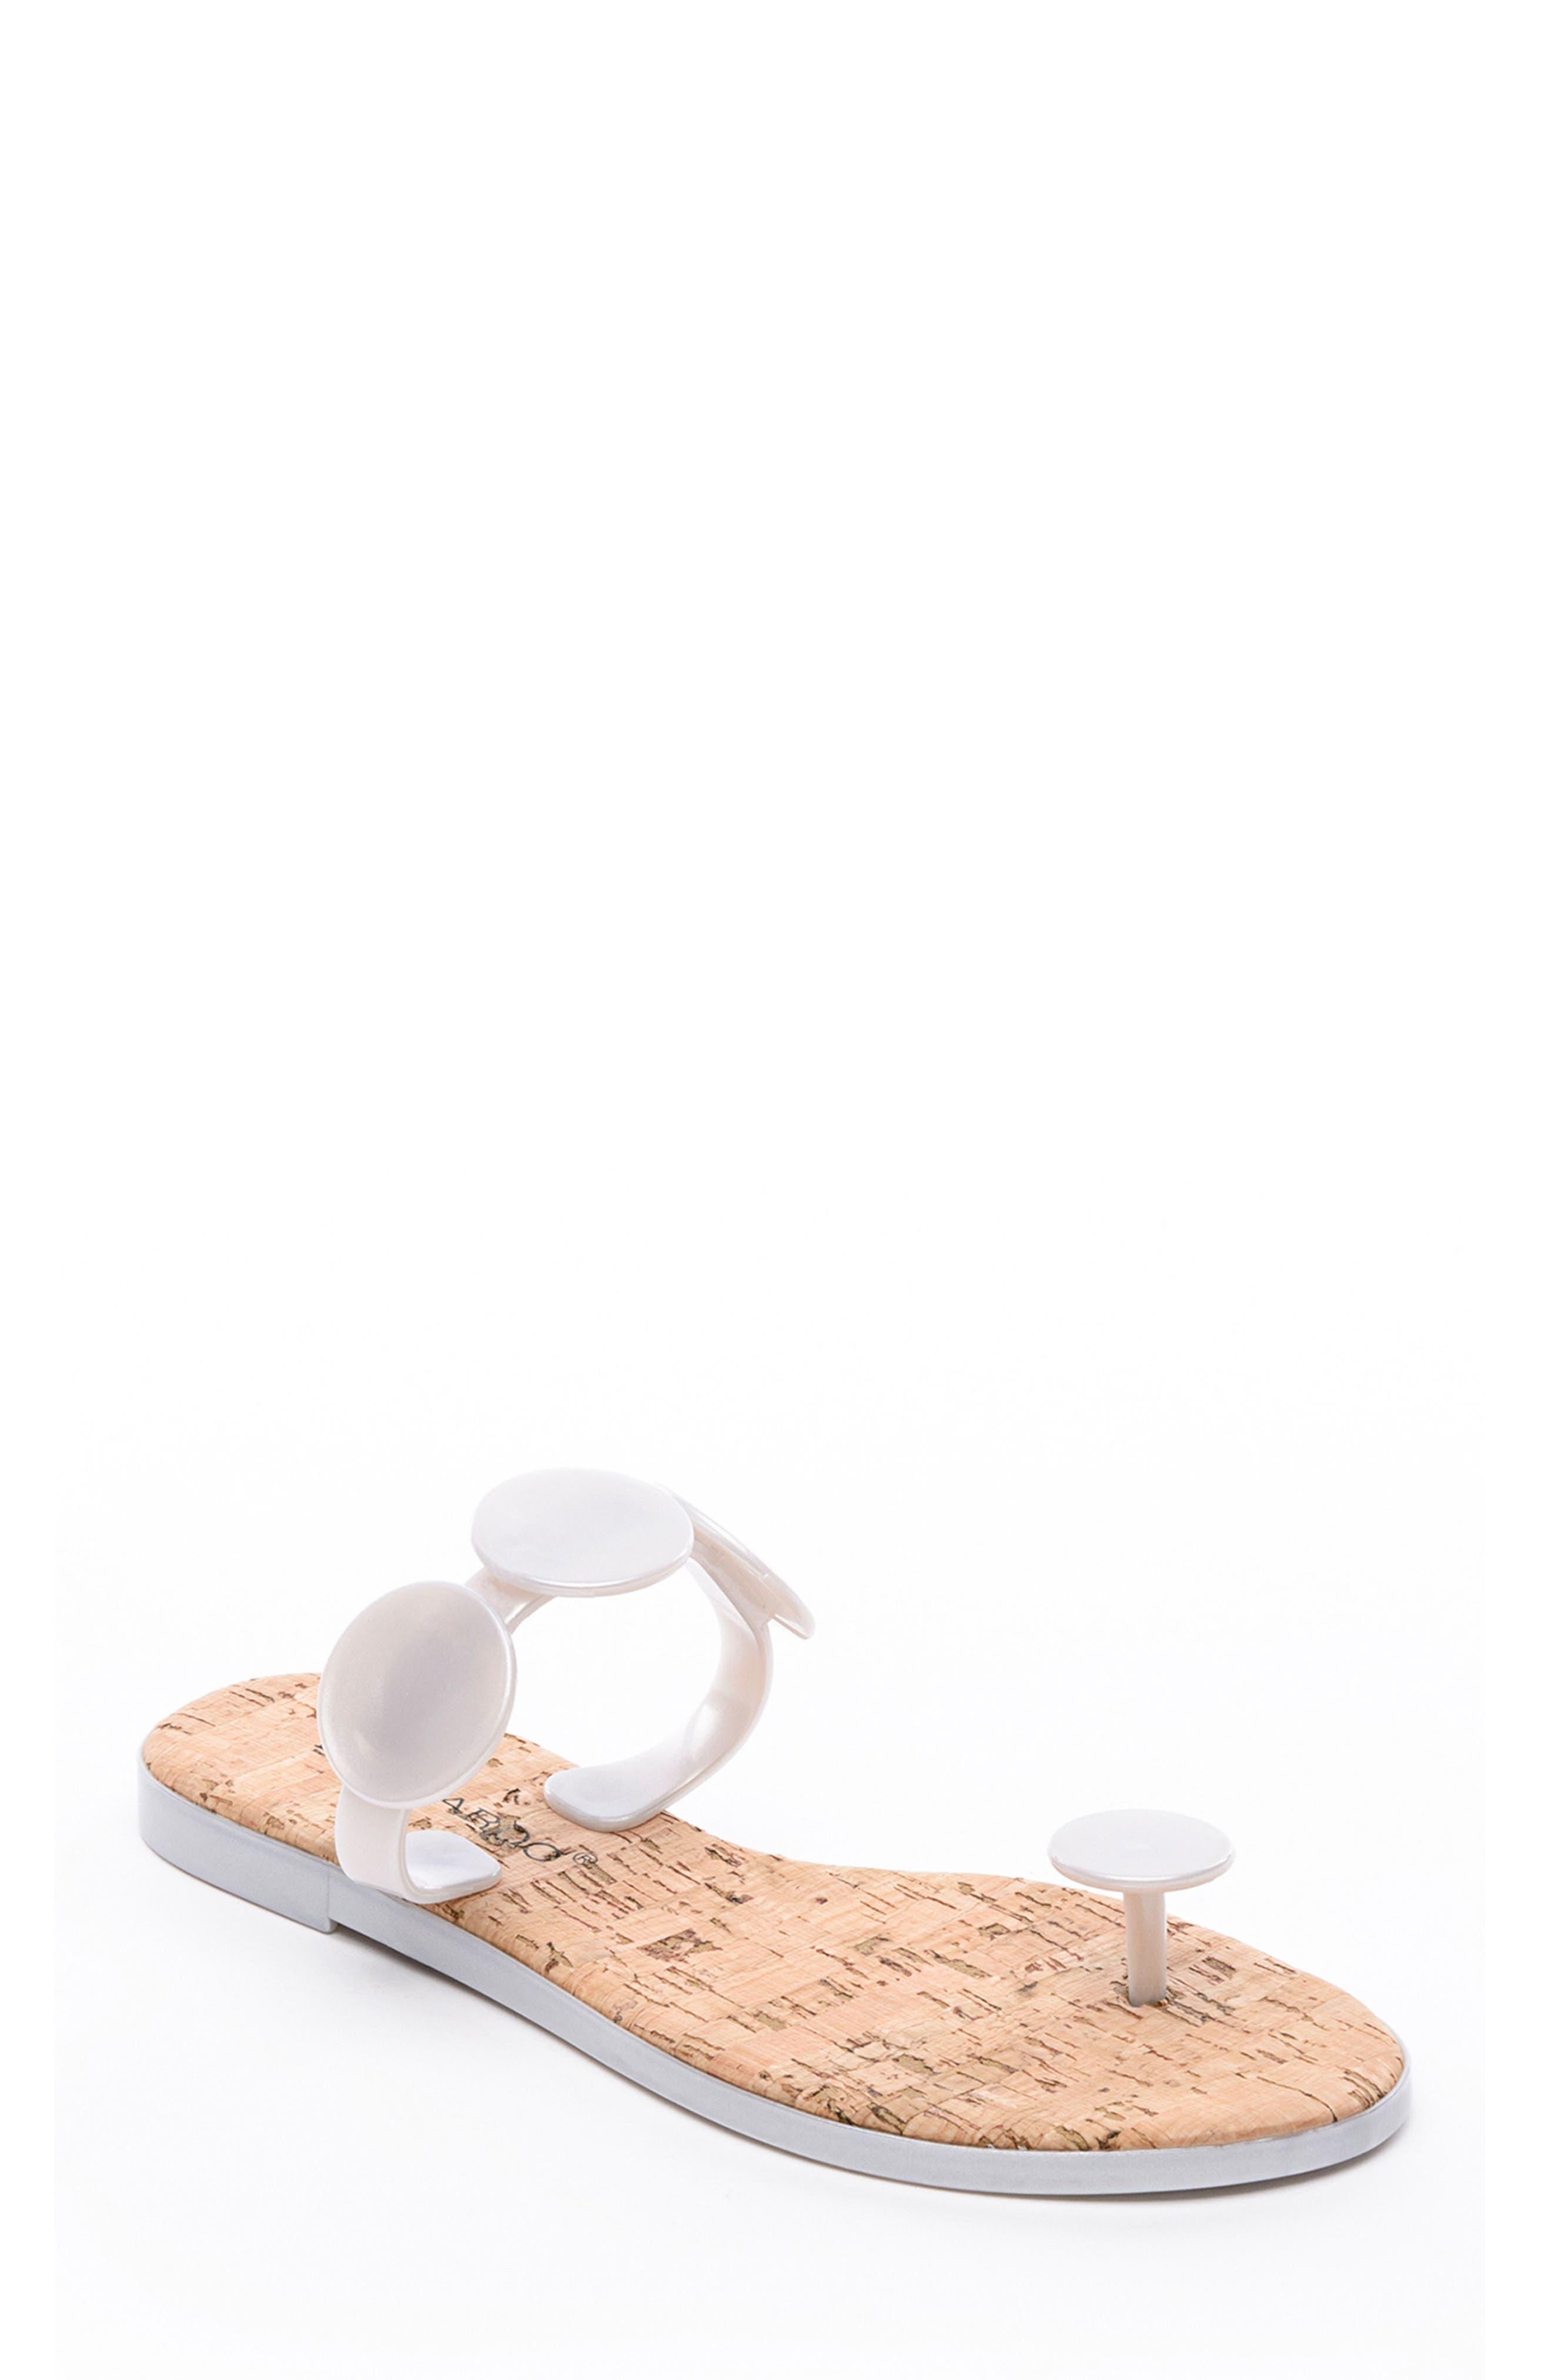 Bernardo New Moon Sandal, Metallic